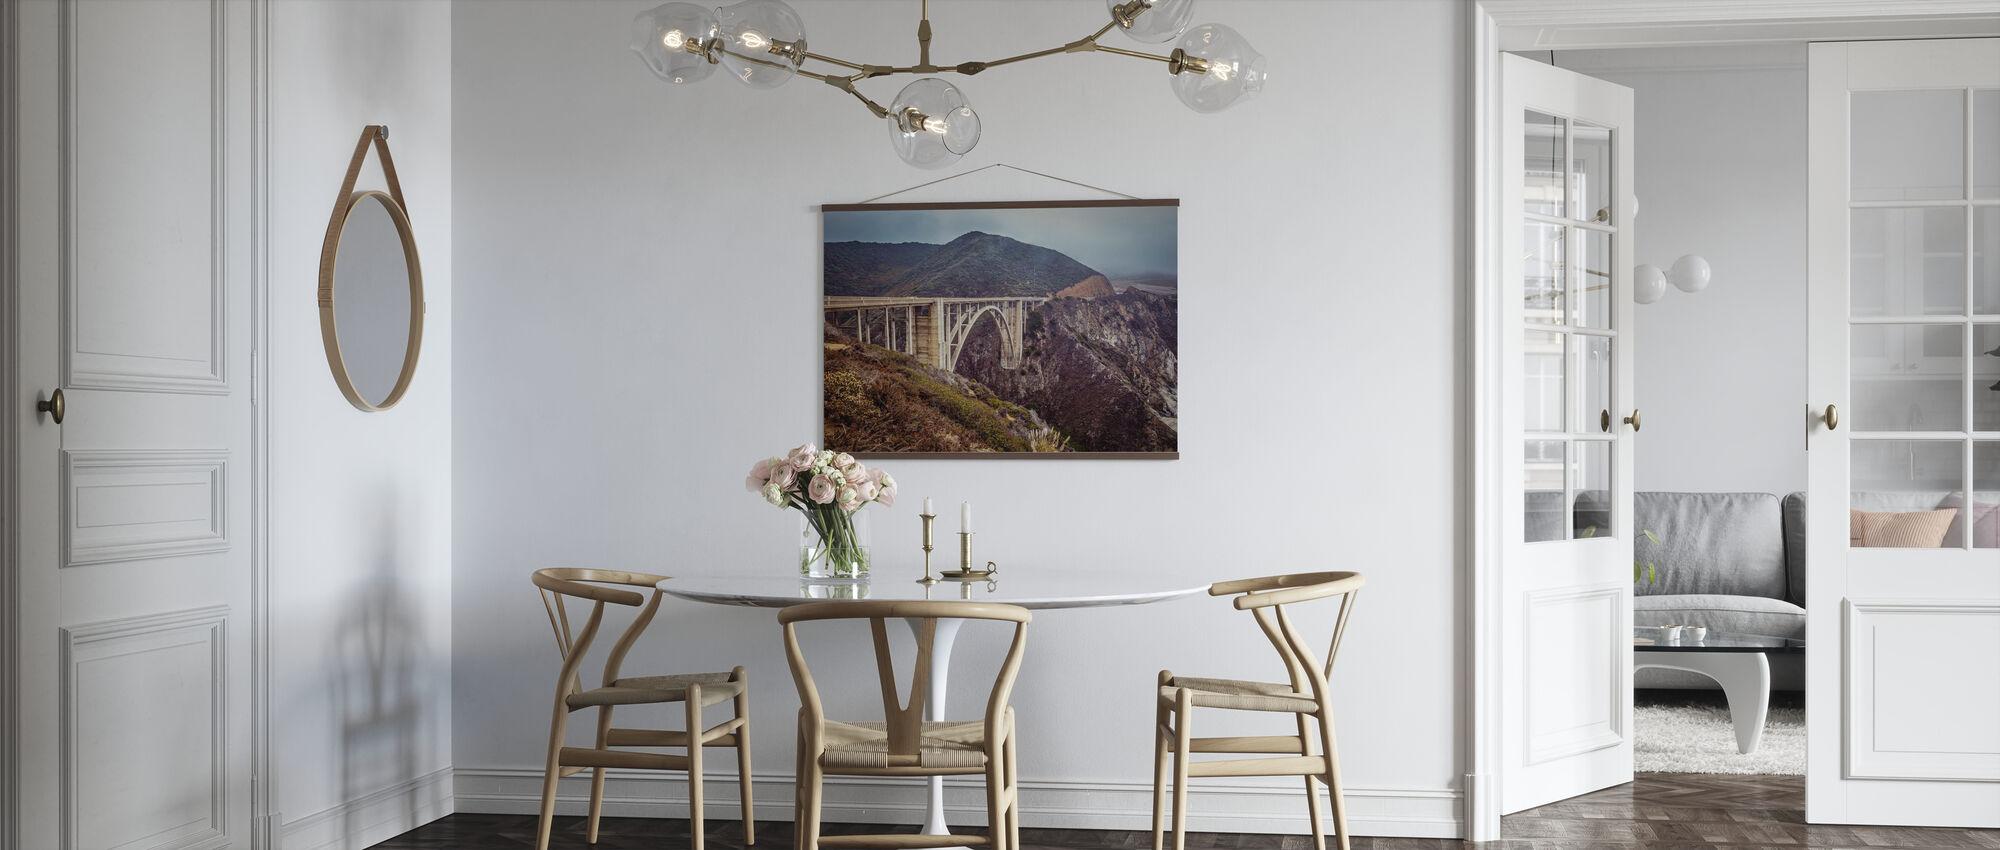 Bixby Bridge Vintage Look - Poster - Keuken